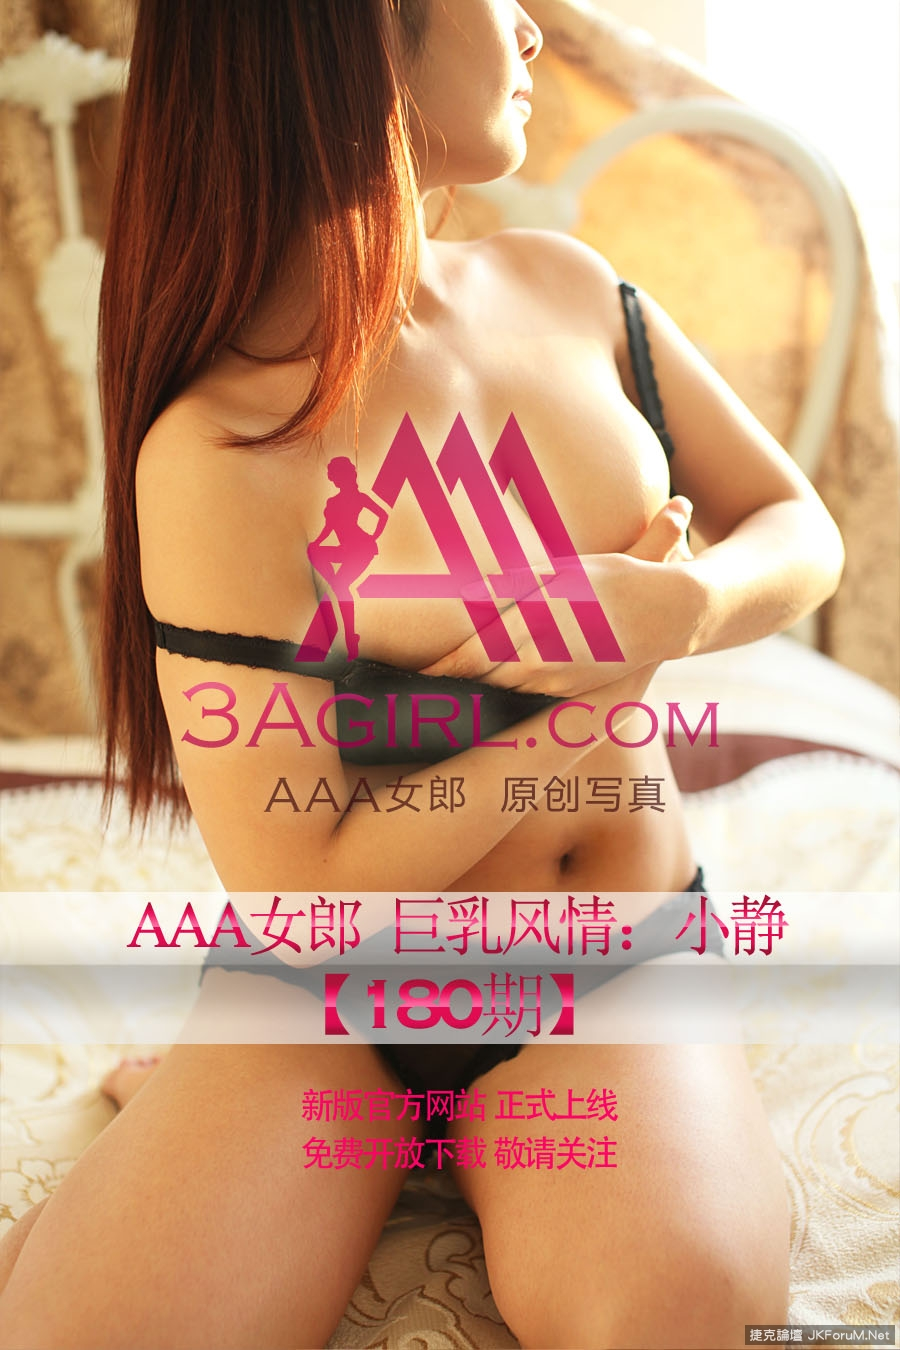 [3Agirl]  No.180 巨乳風情 小靜 (41P) - 貼圖 - 絲襪美腿 -